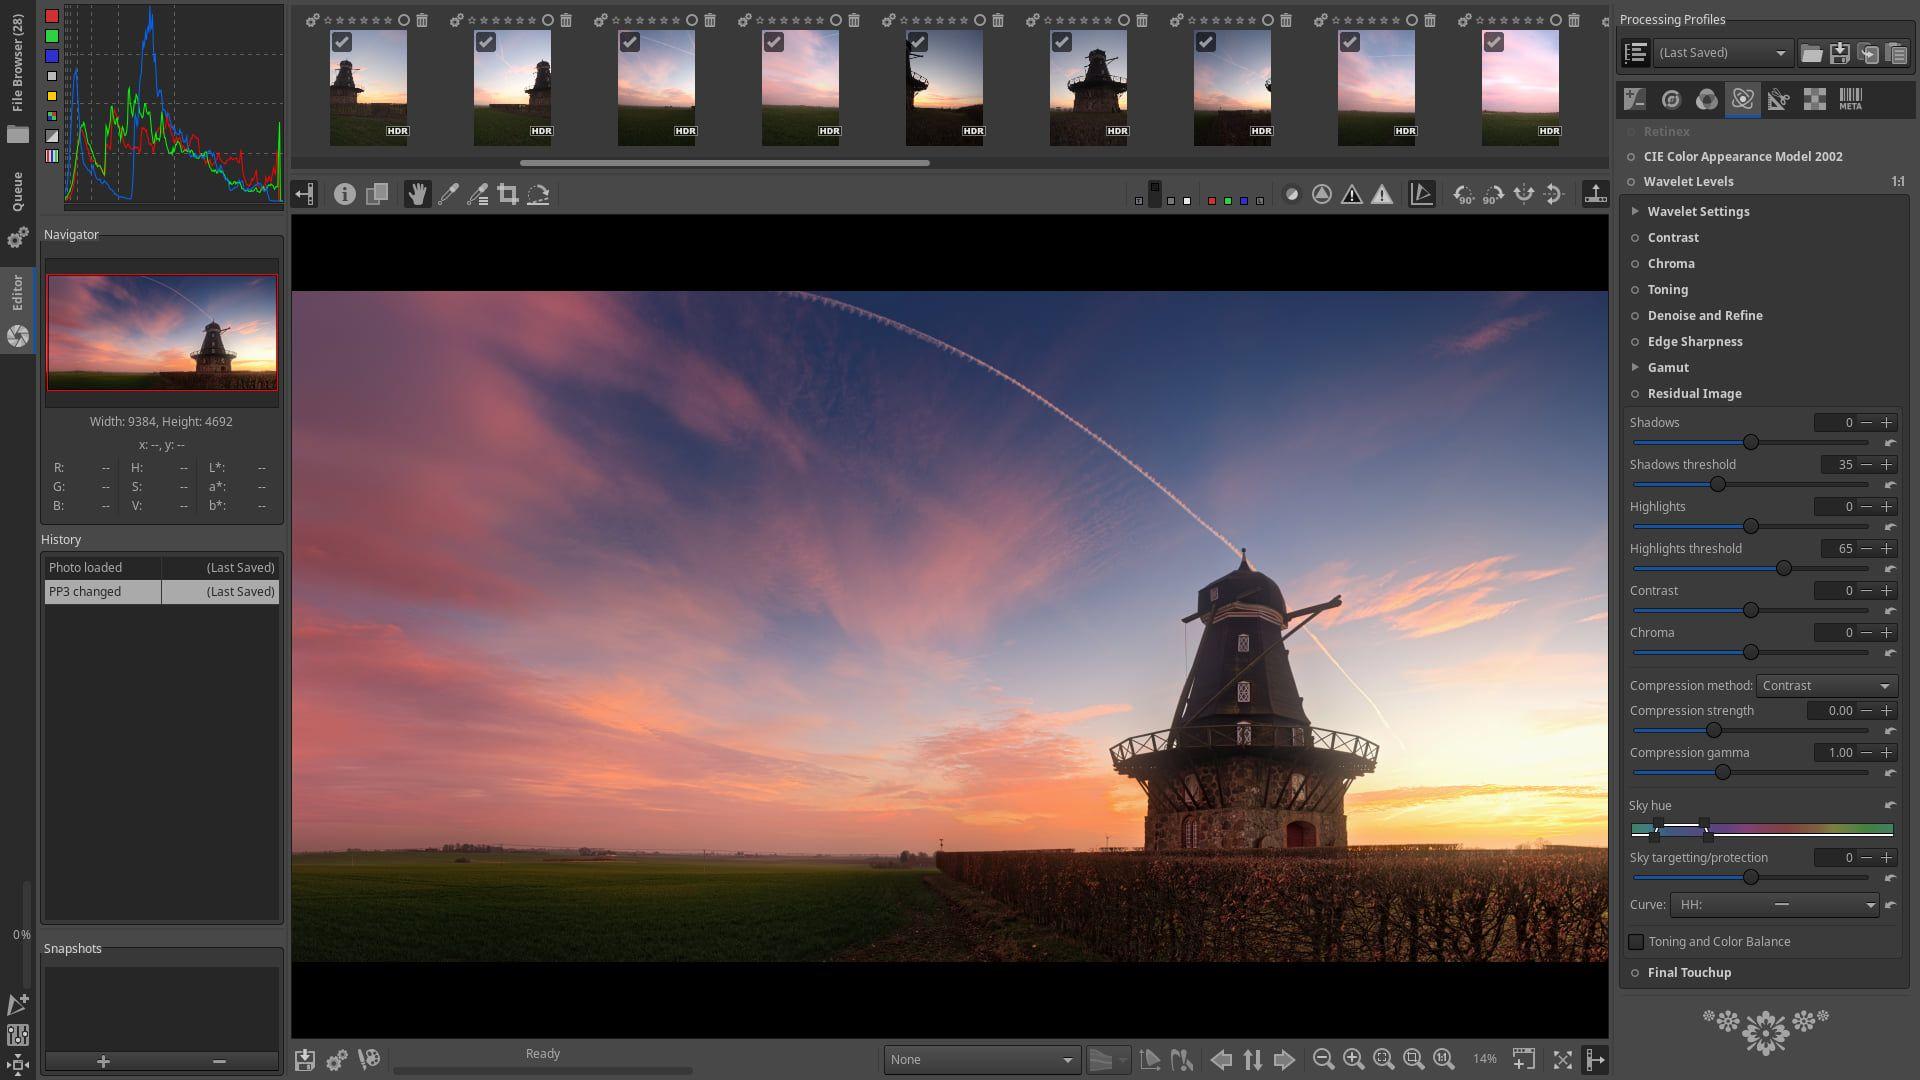 RawTherapee v5.7 (MacOS) A free raw image processing